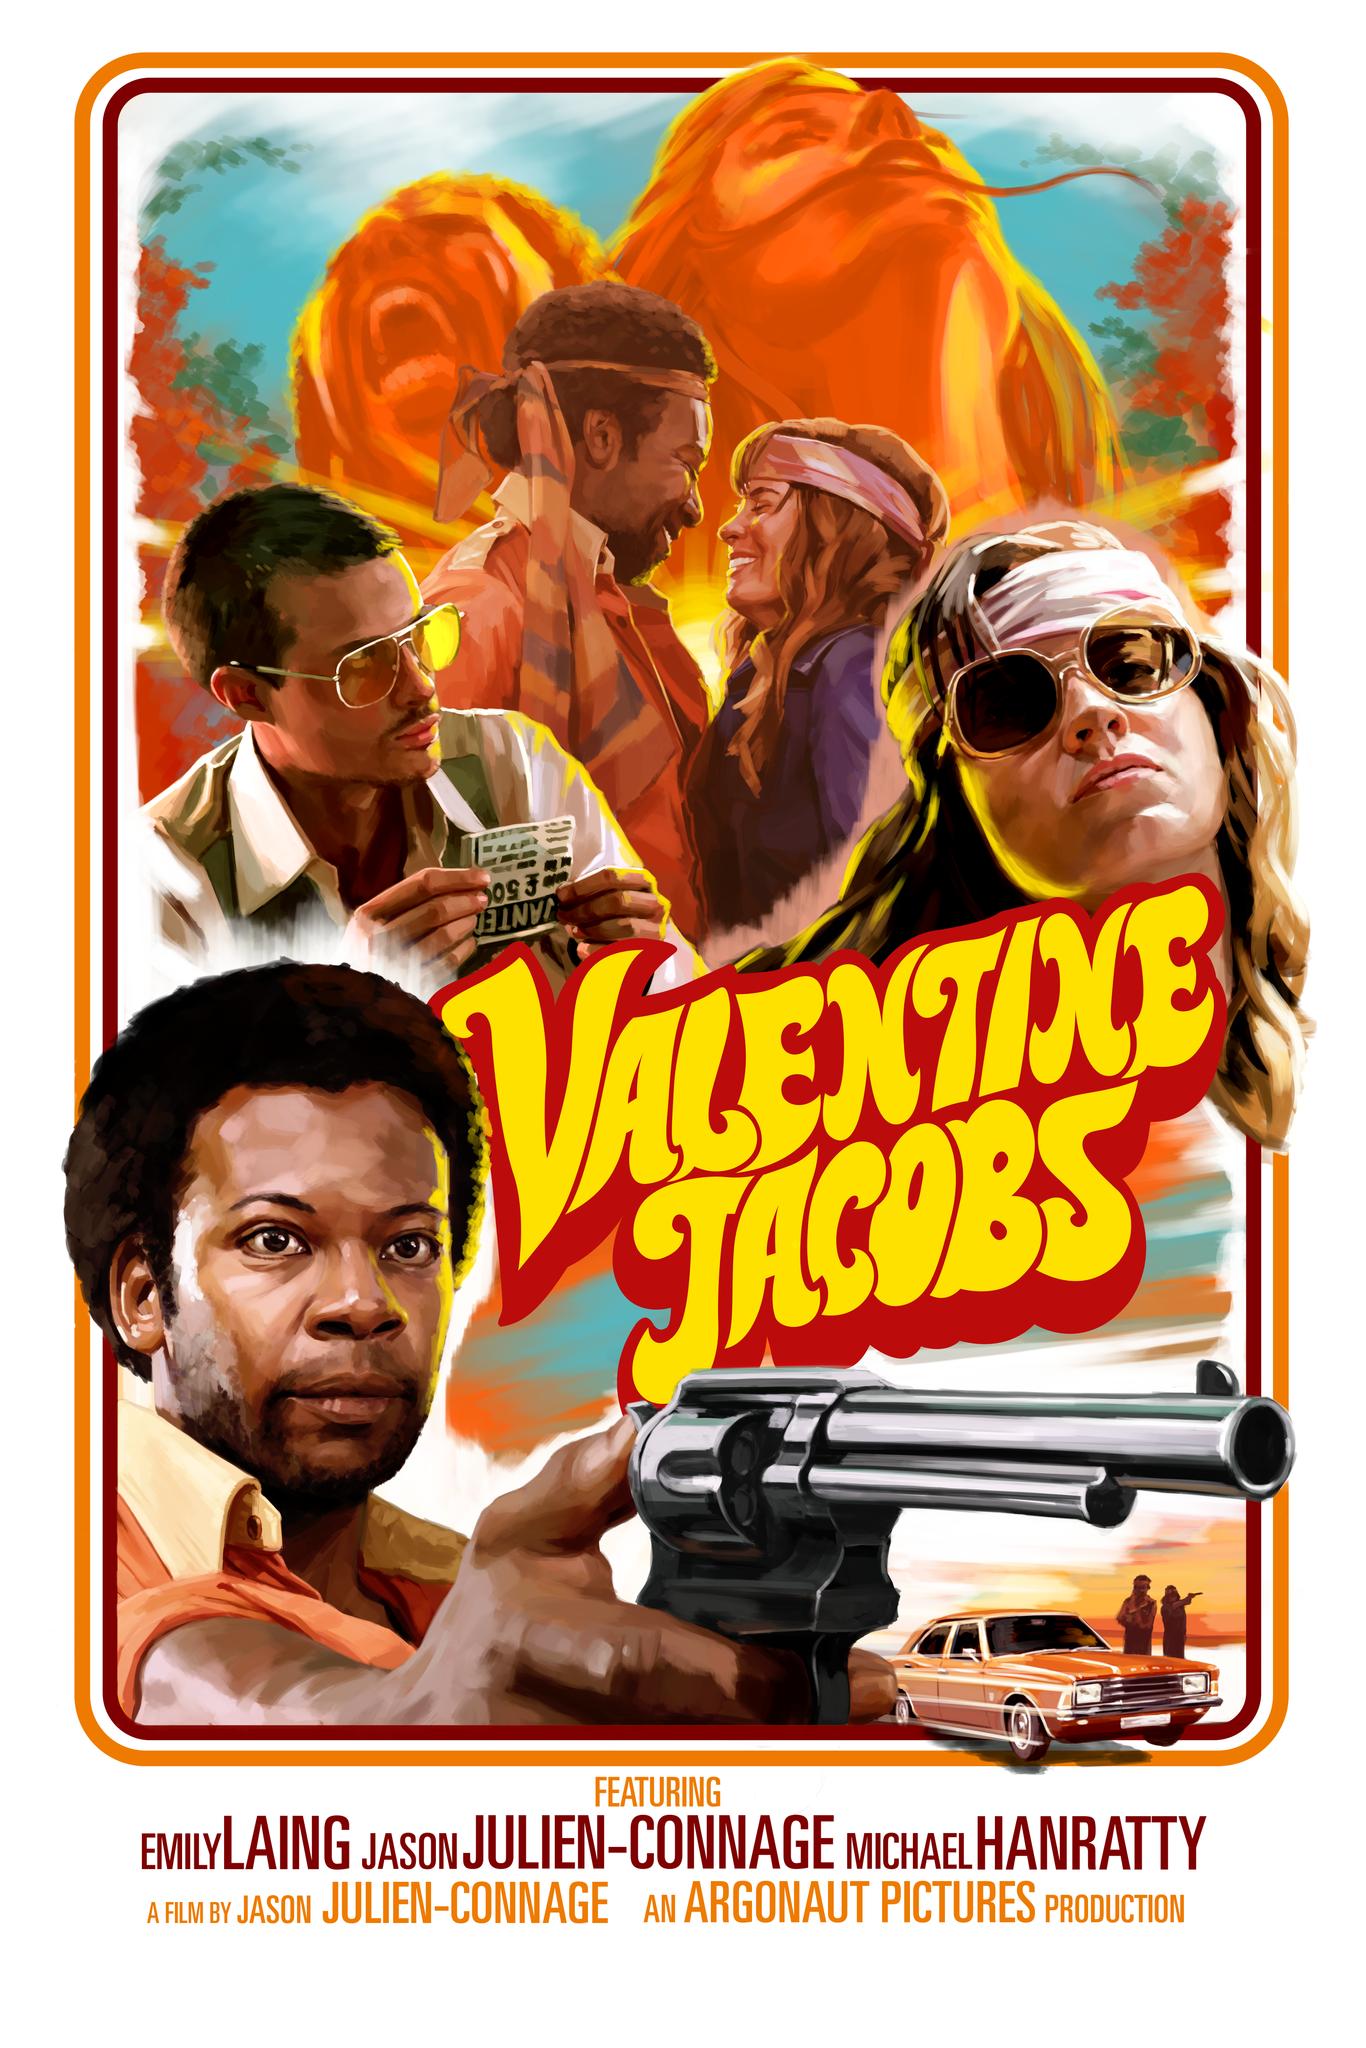 Argonaut Pictures Valentine Jacobs Official Poster